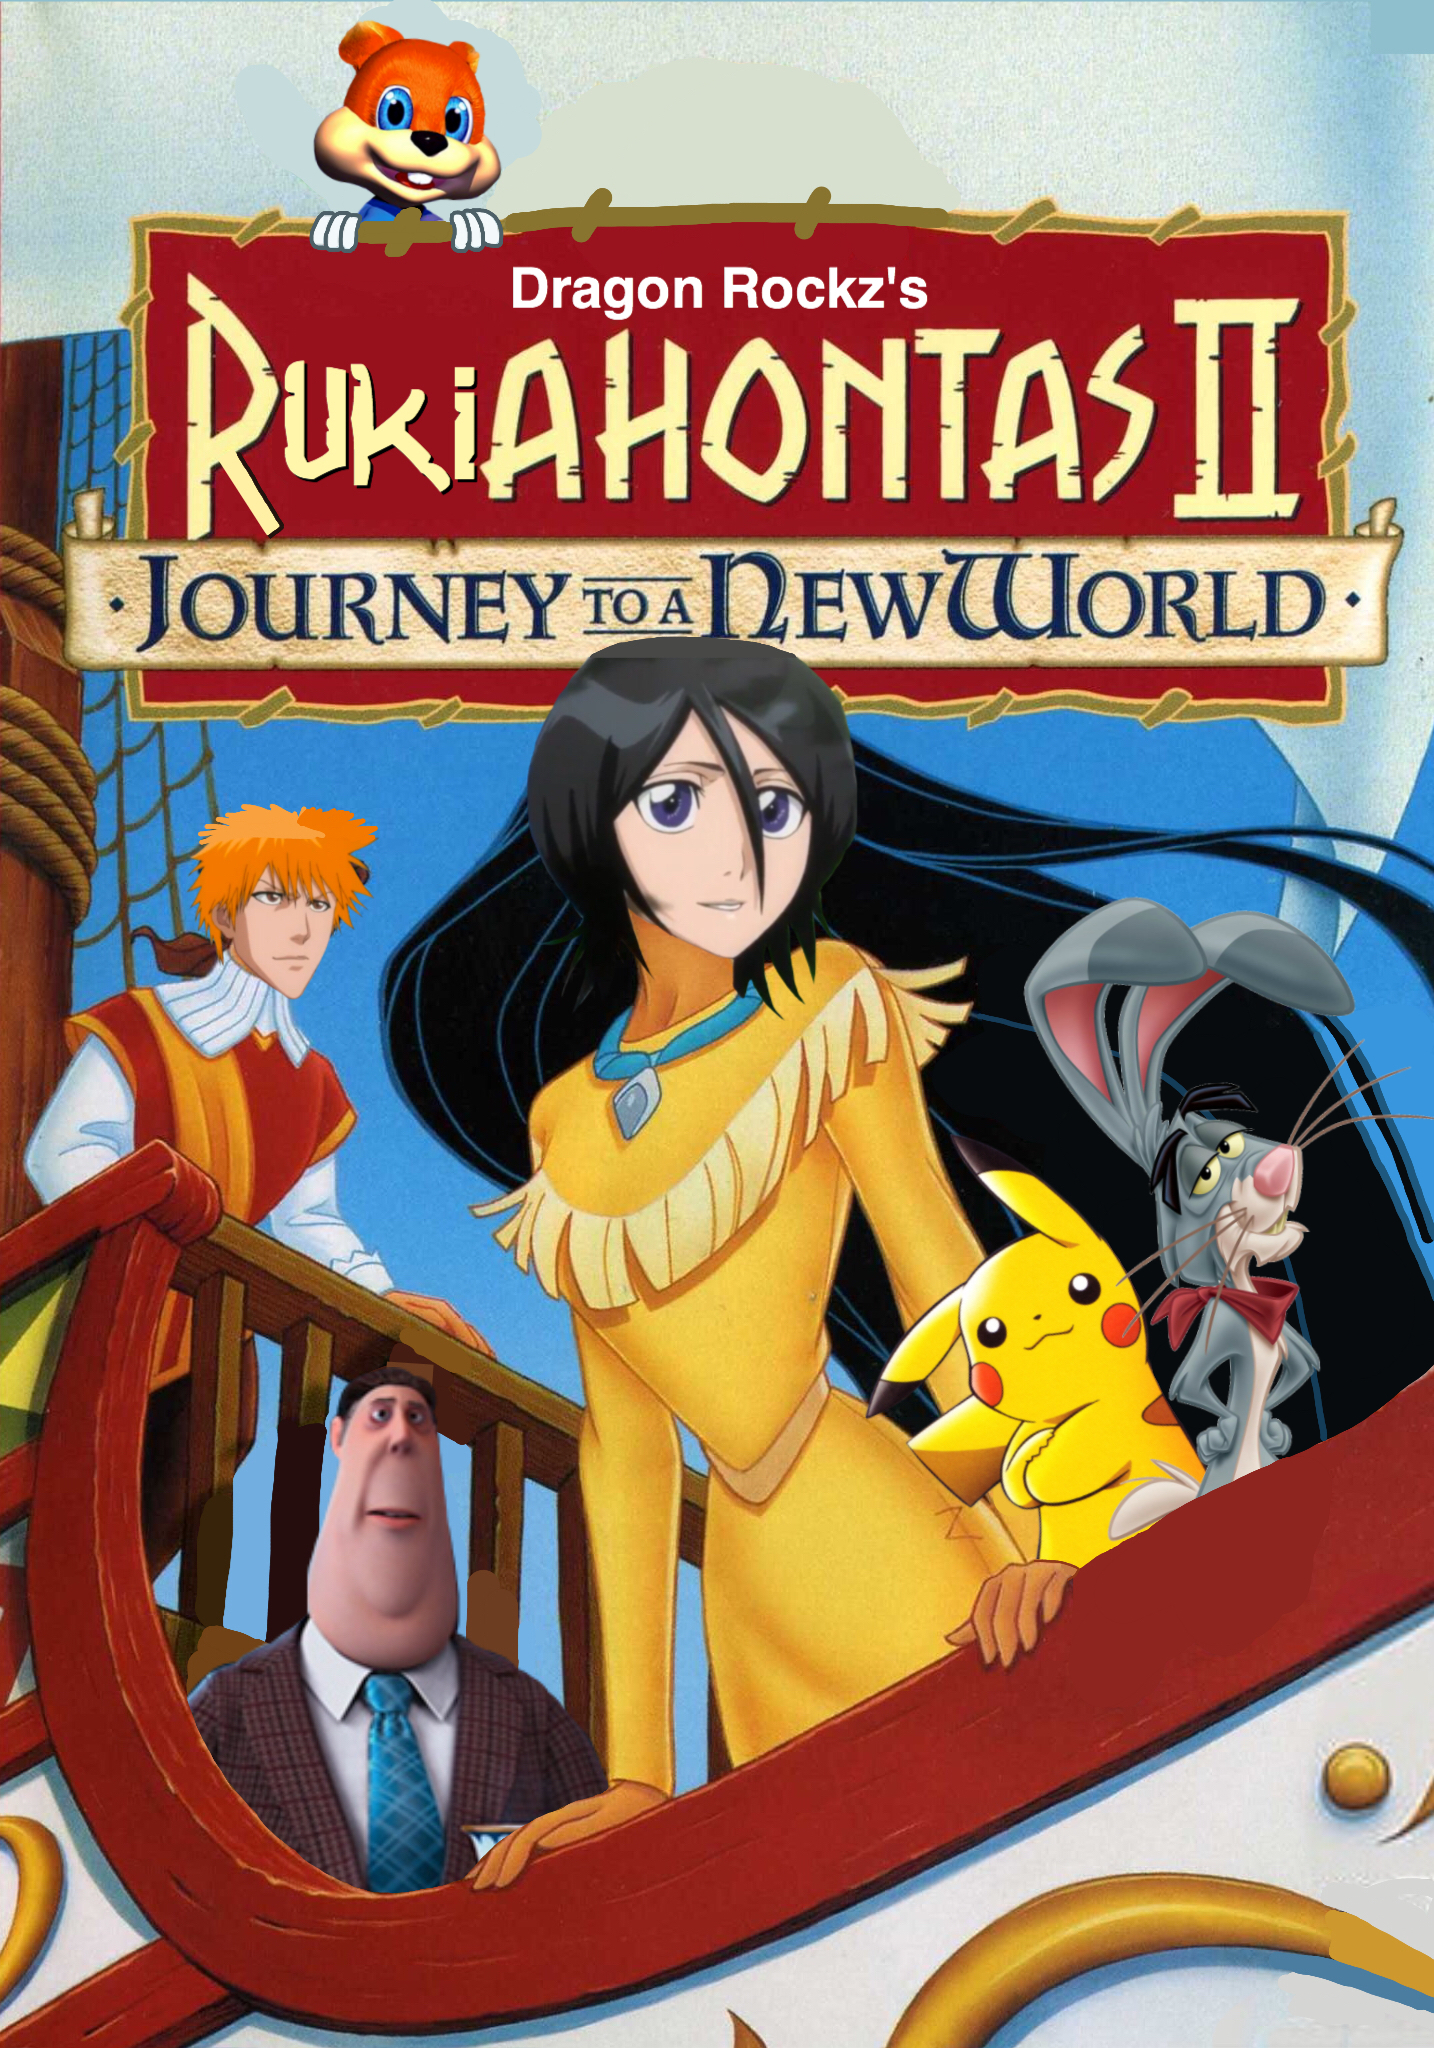 Rukiahontas II: Journey to a New World